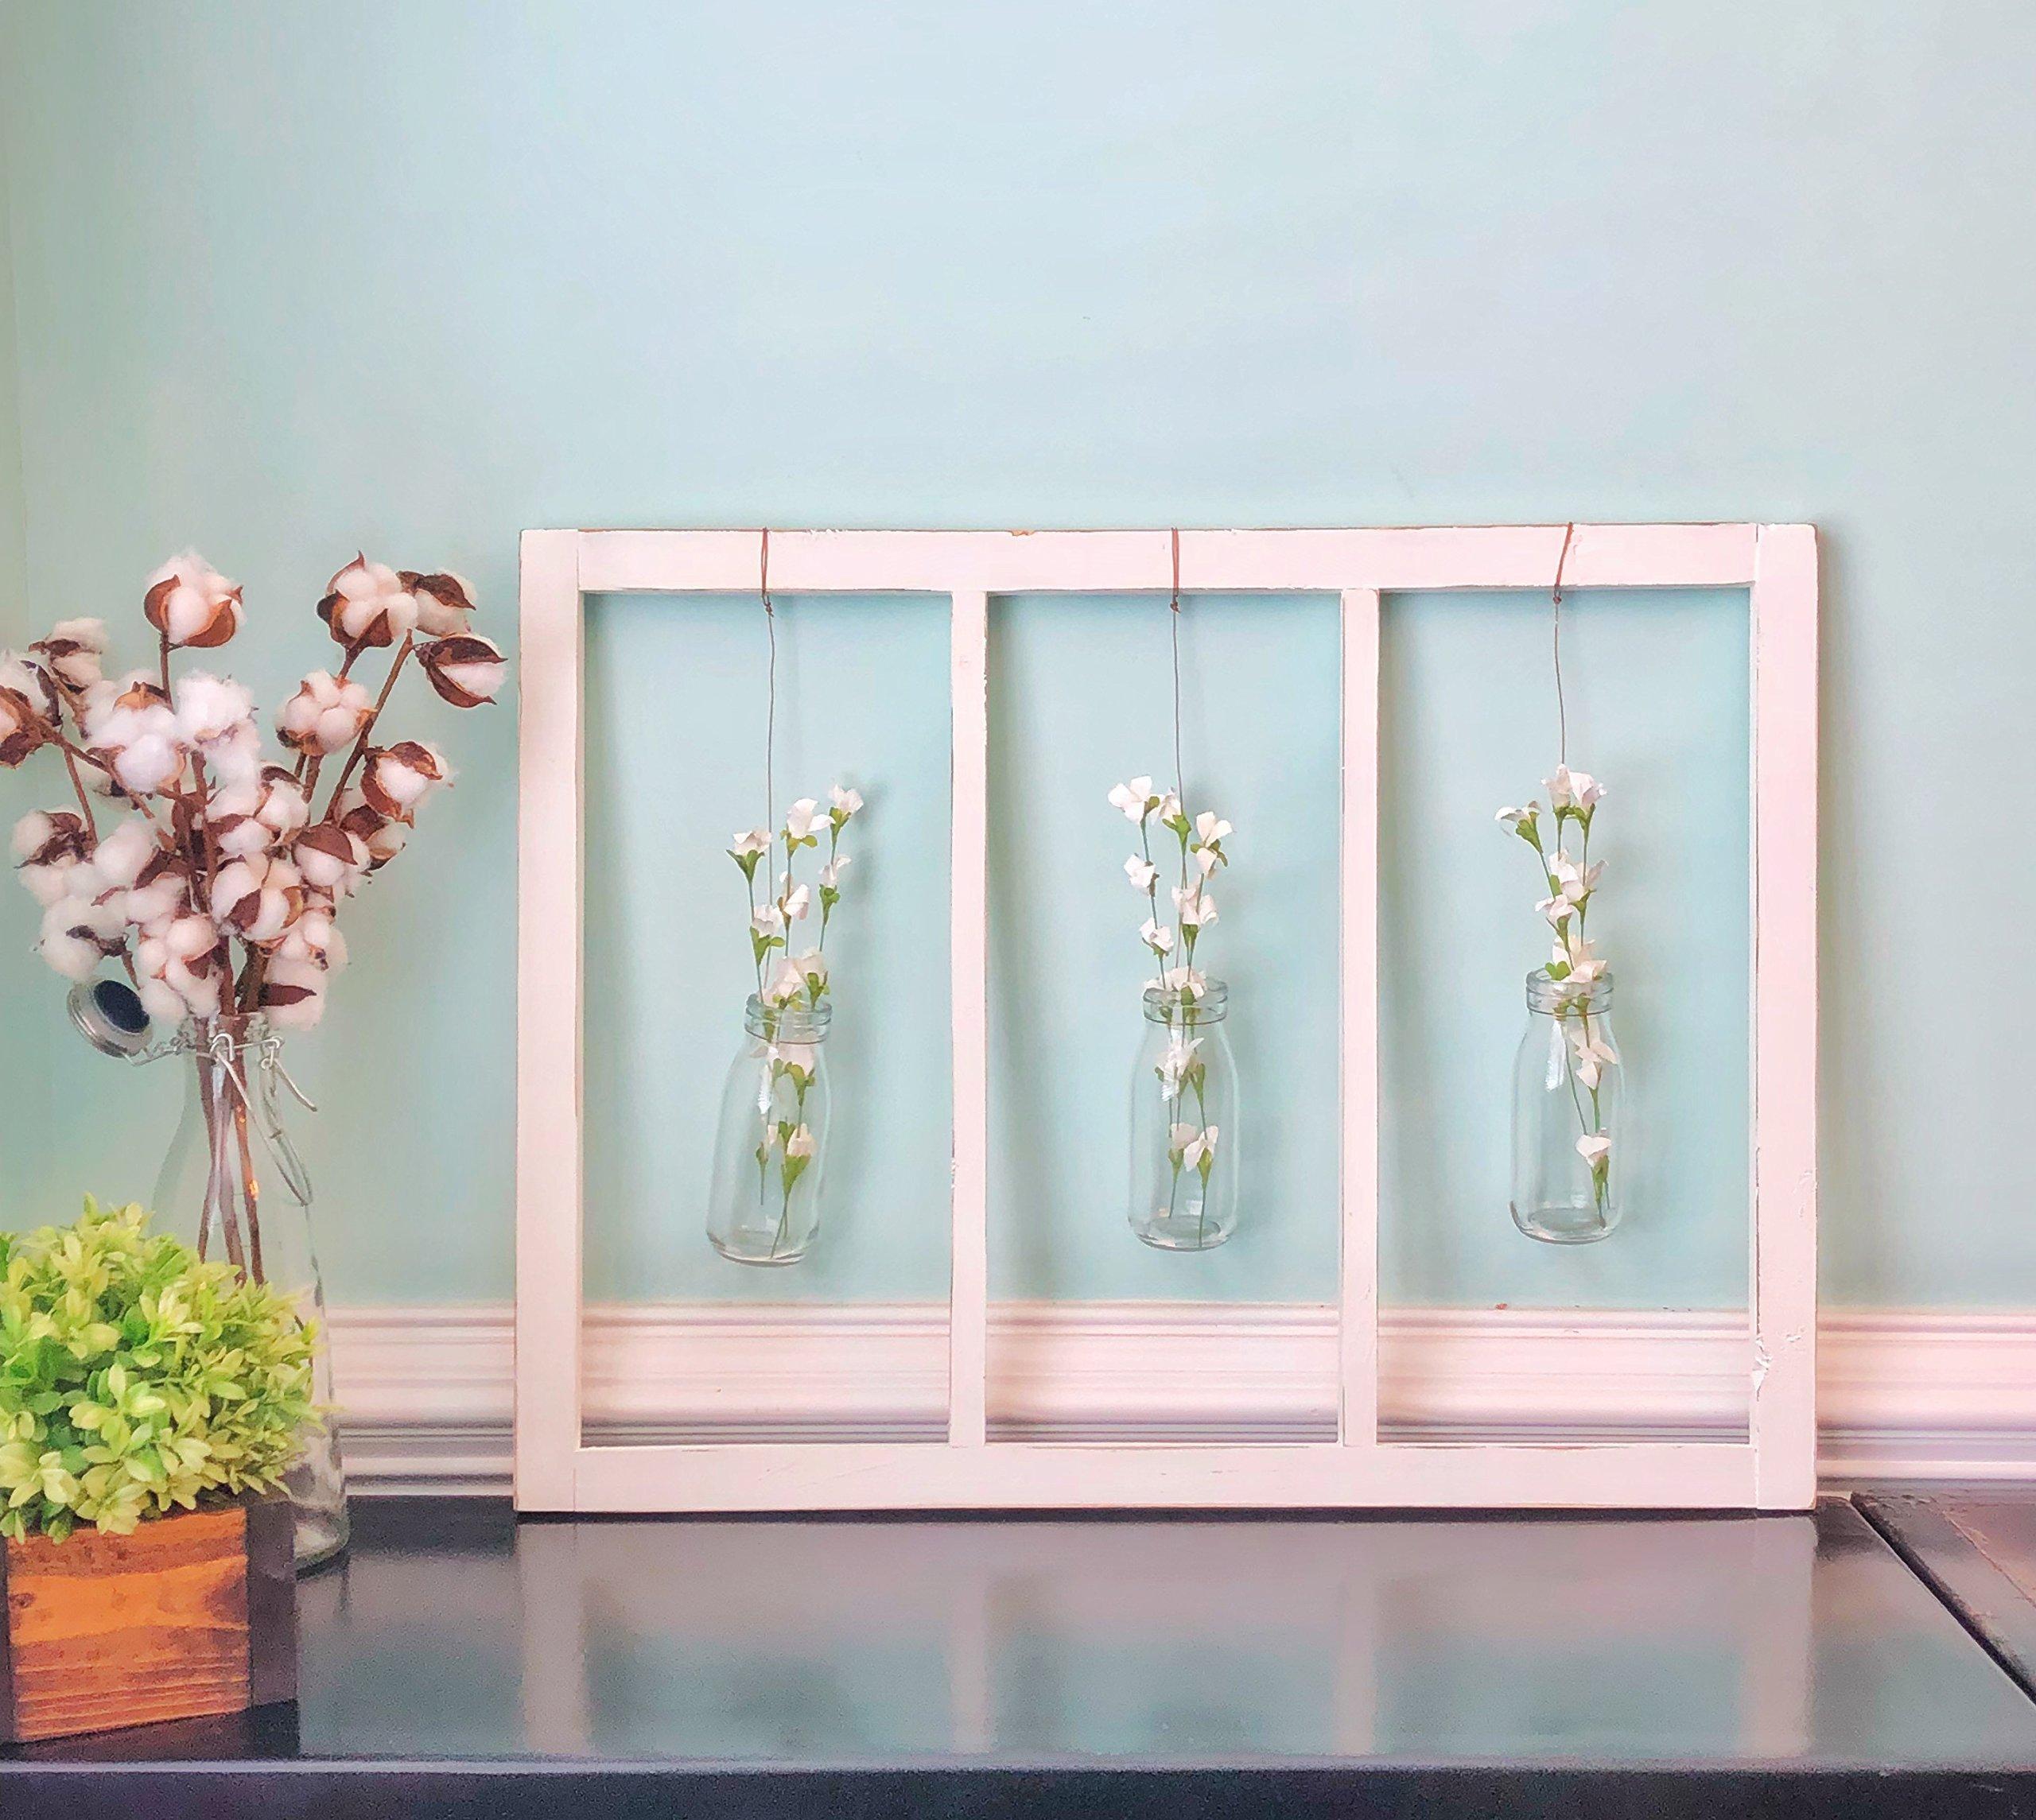 Handmade 3 Pane Window with floral milk bottles